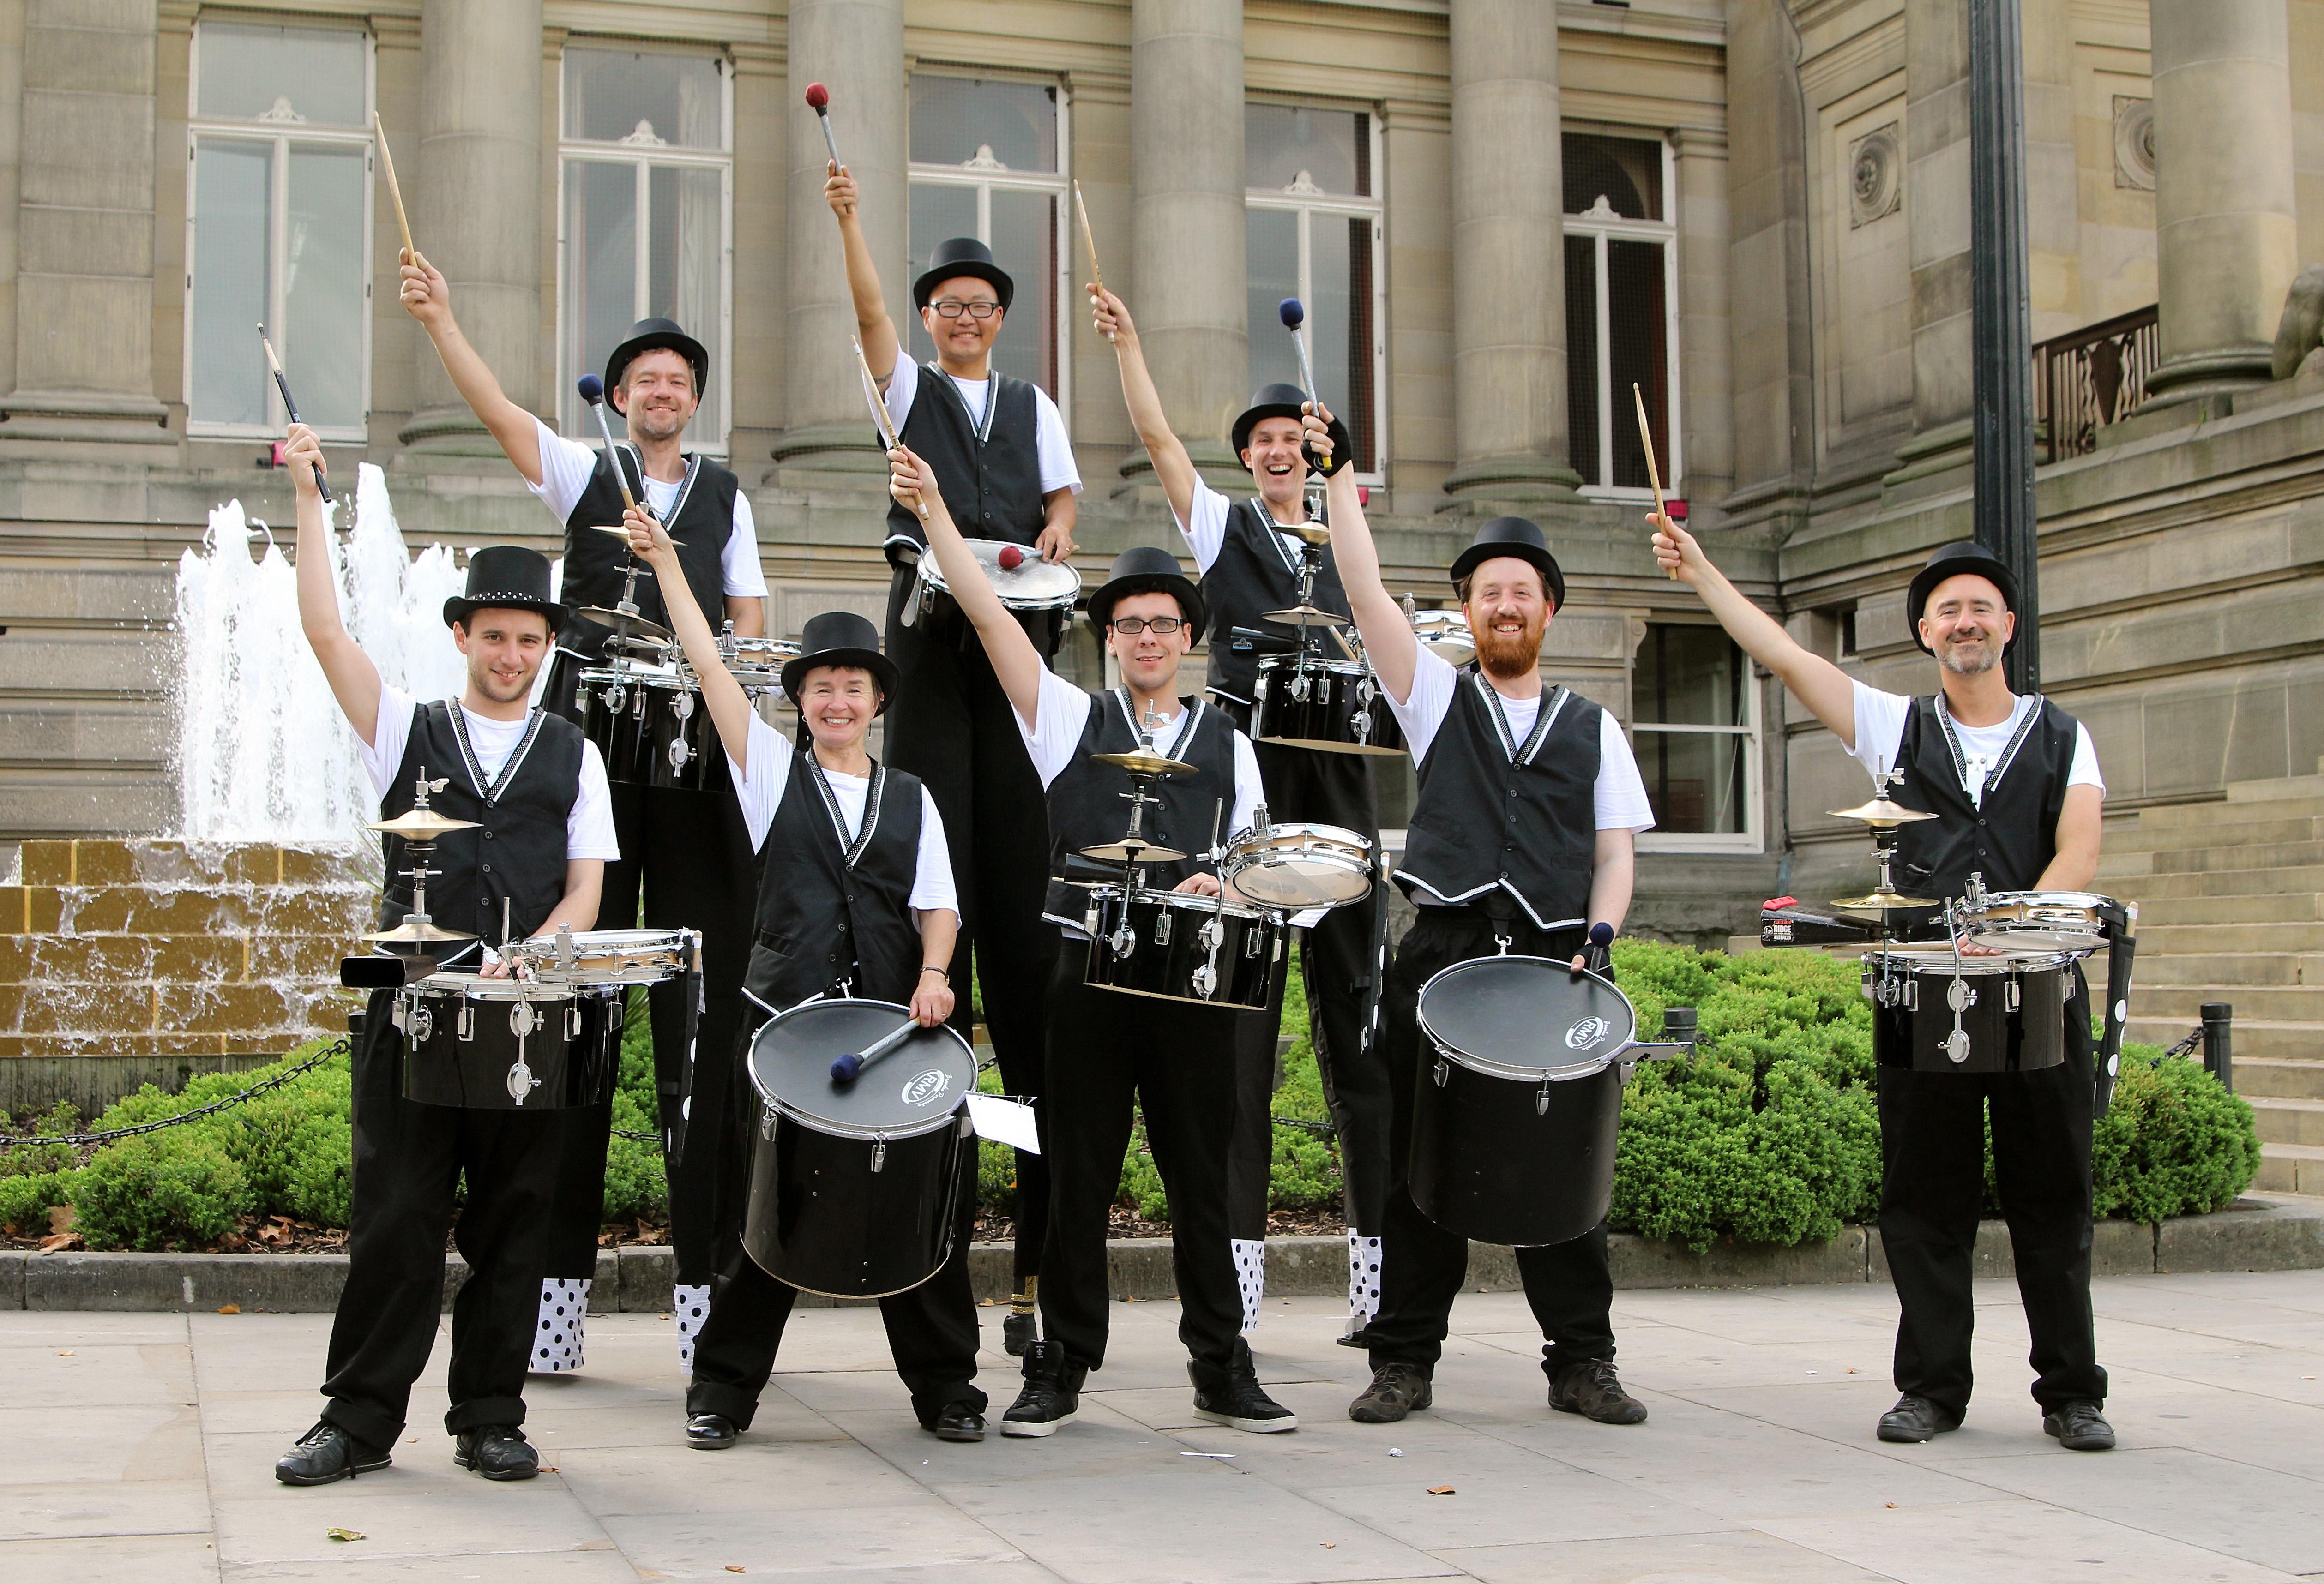 Drumming Band Mitch